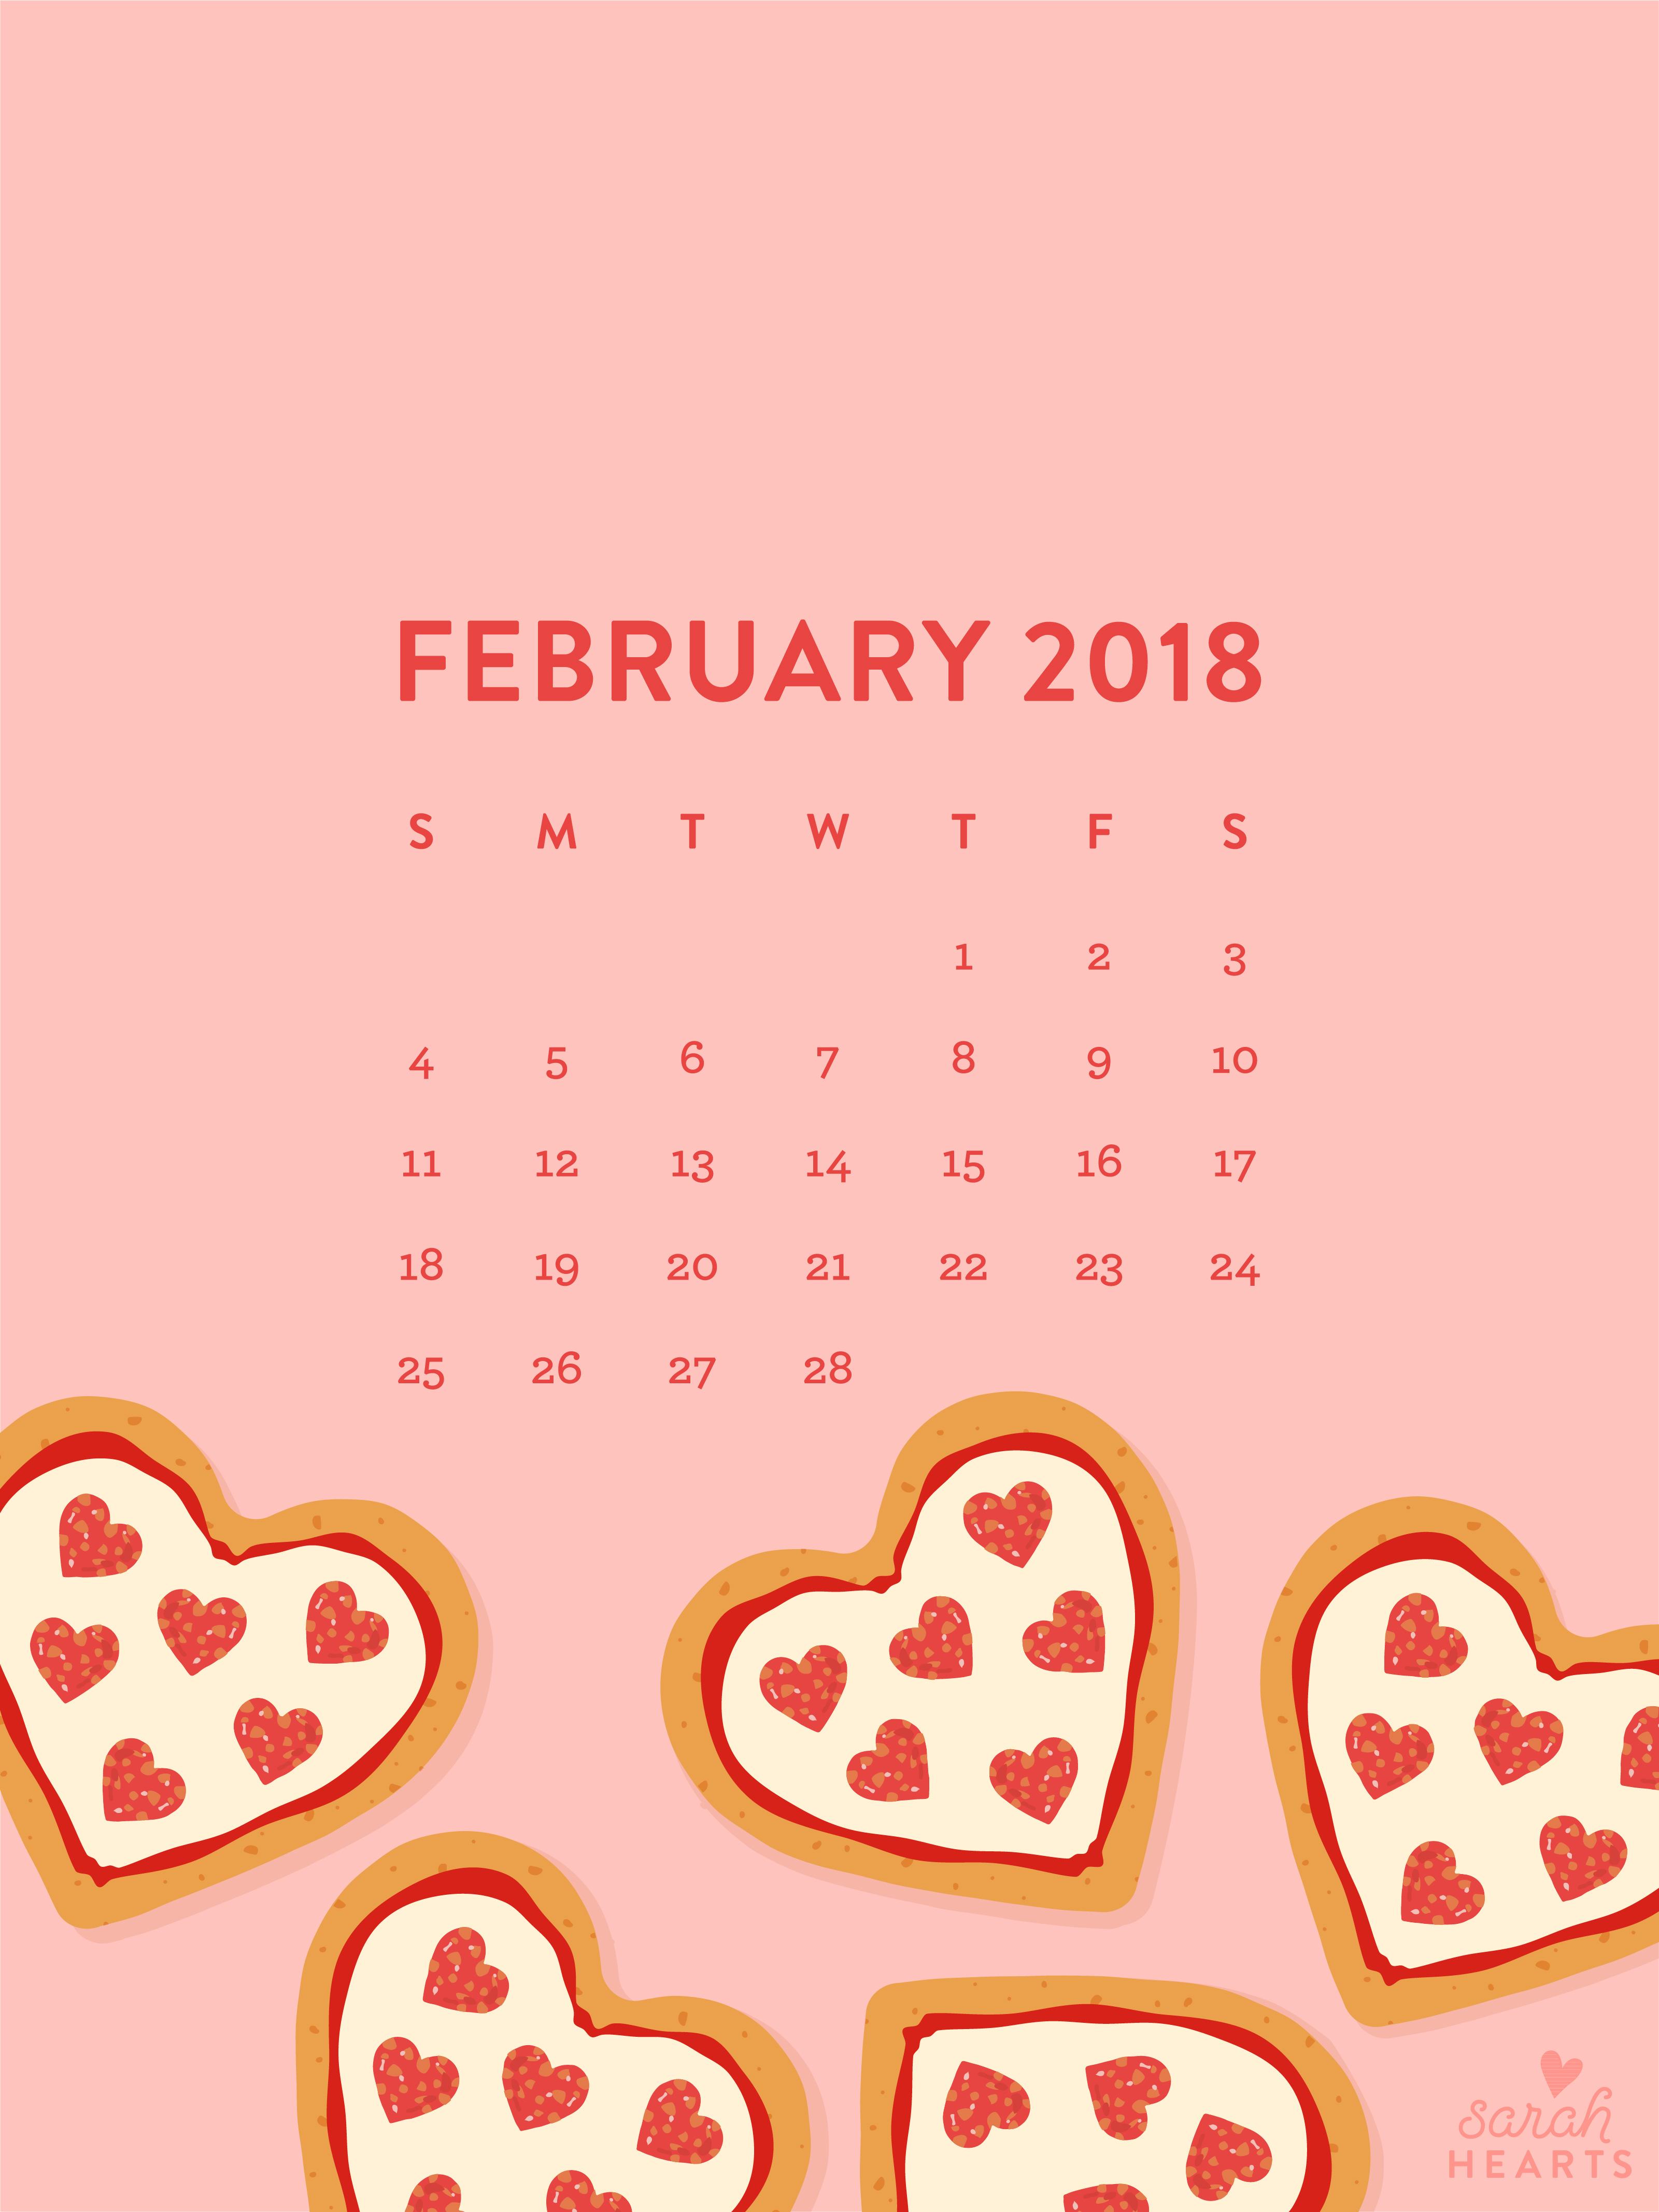 Pizza Wallpaper Cute Heart Shaped Pizza February 2018 Calendar Wallpaper